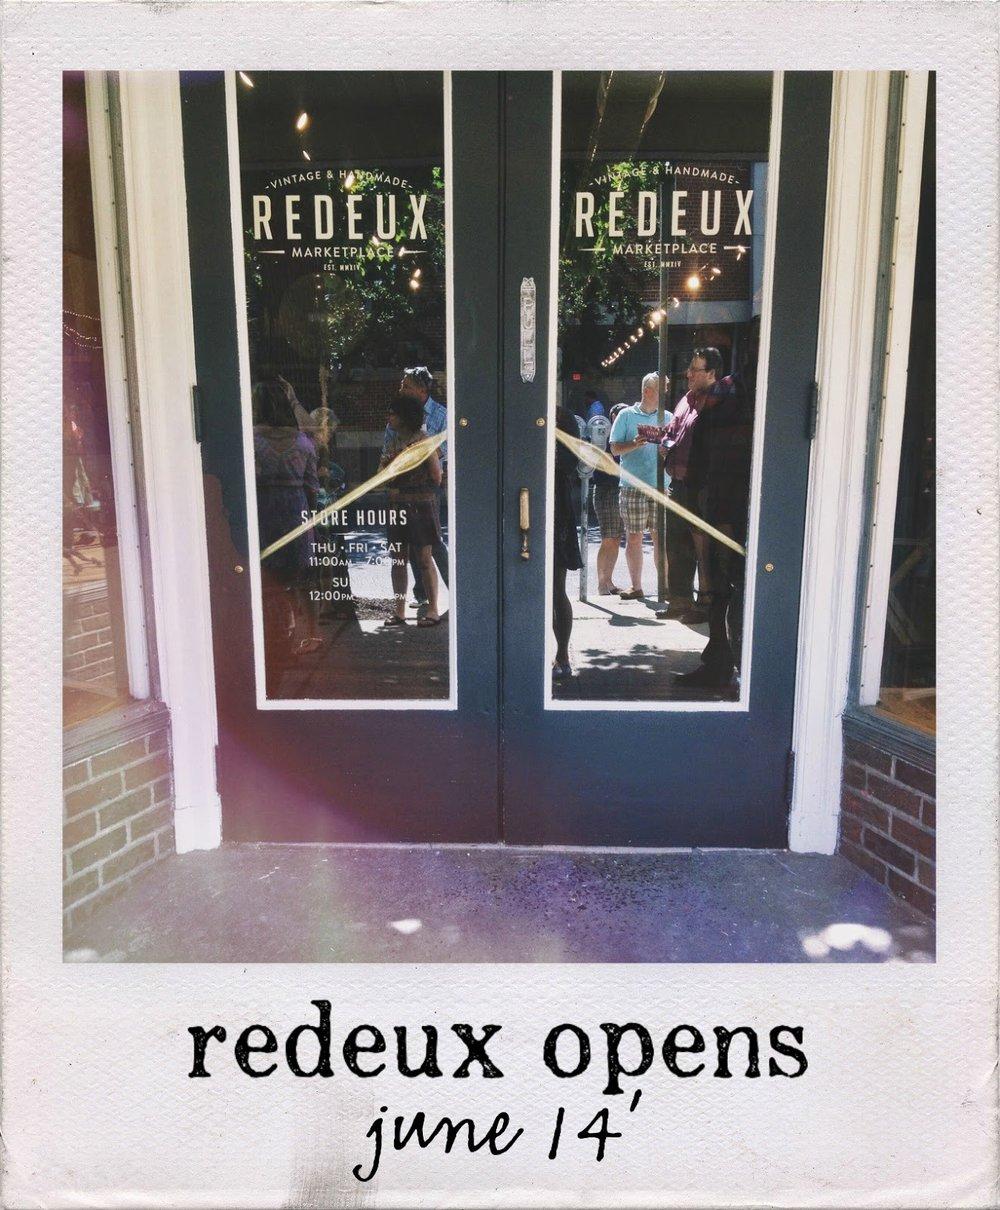 http://lovemrsmack.blogspot.com/2014/06/redeux-opening.html